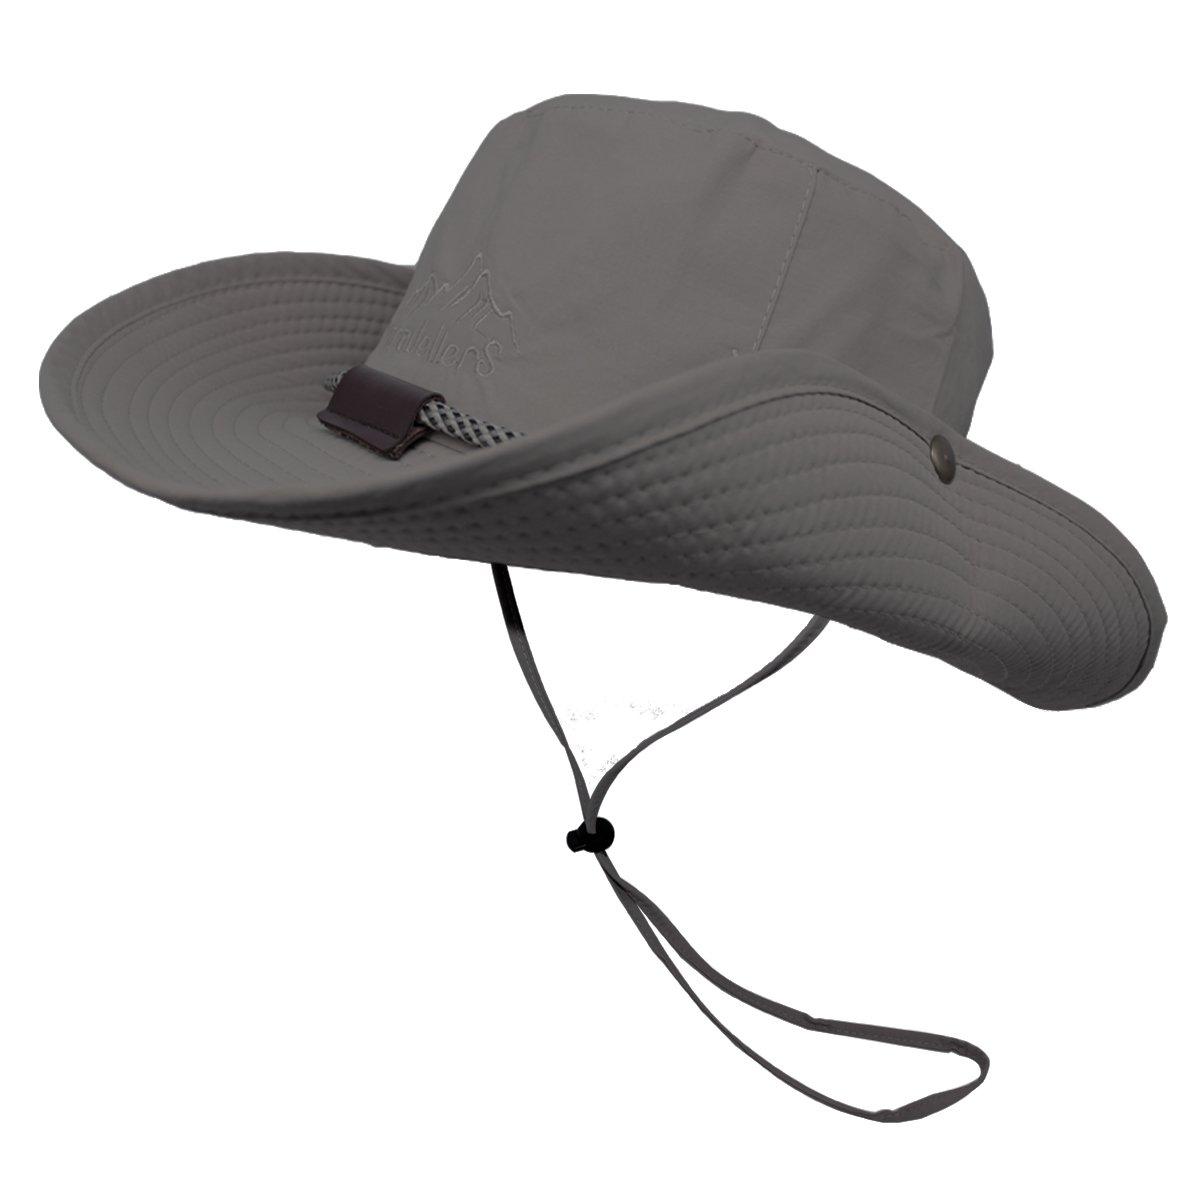 f10d7564689 OMECHY Waterproof Outdoor Bucket Hat Summer UV Protection Sun Cap Boonie  Fishing Camouflage Hat